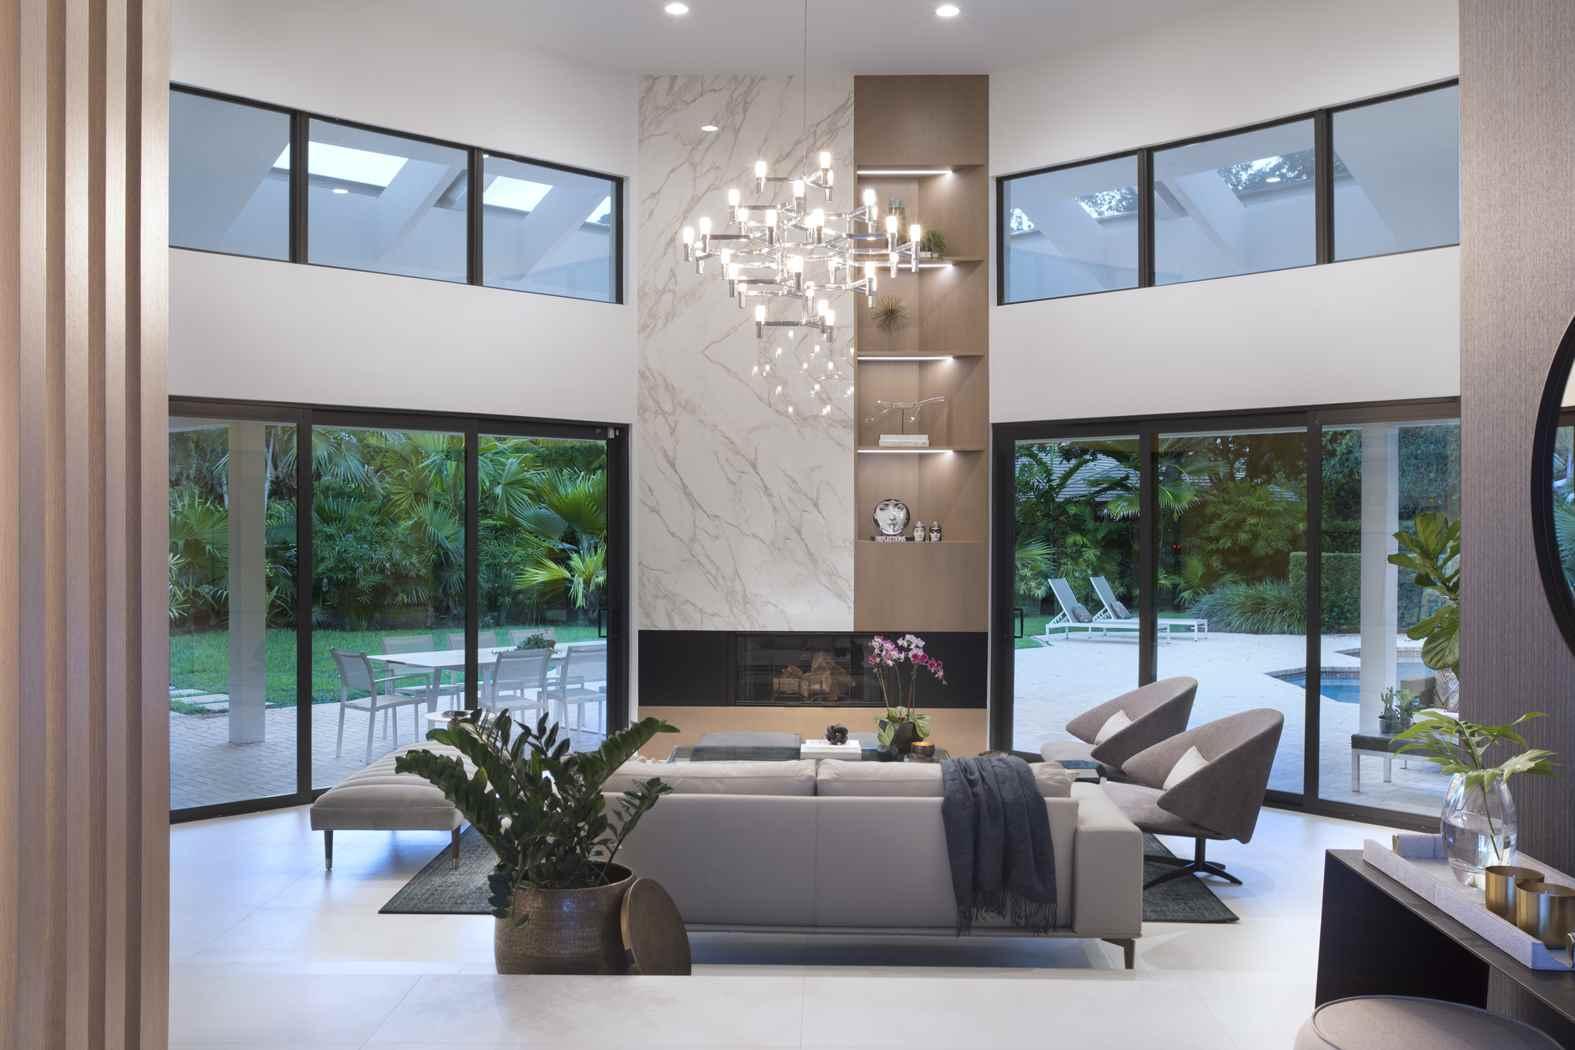 Interior Design Coral Gables A Cocoplum Contemporary Oasis